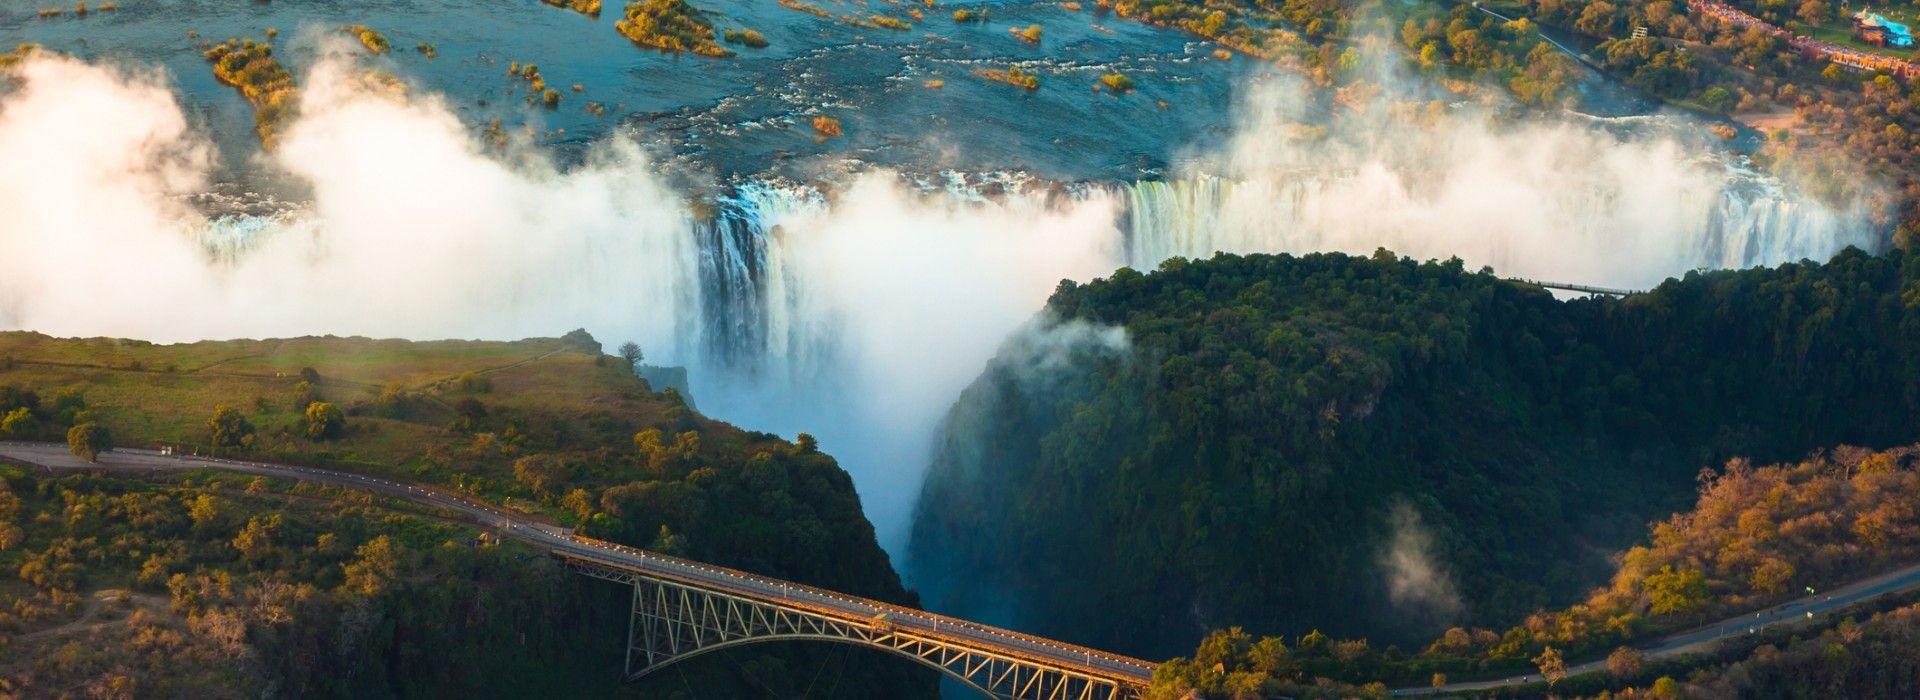 Adventure Tours in Zambia